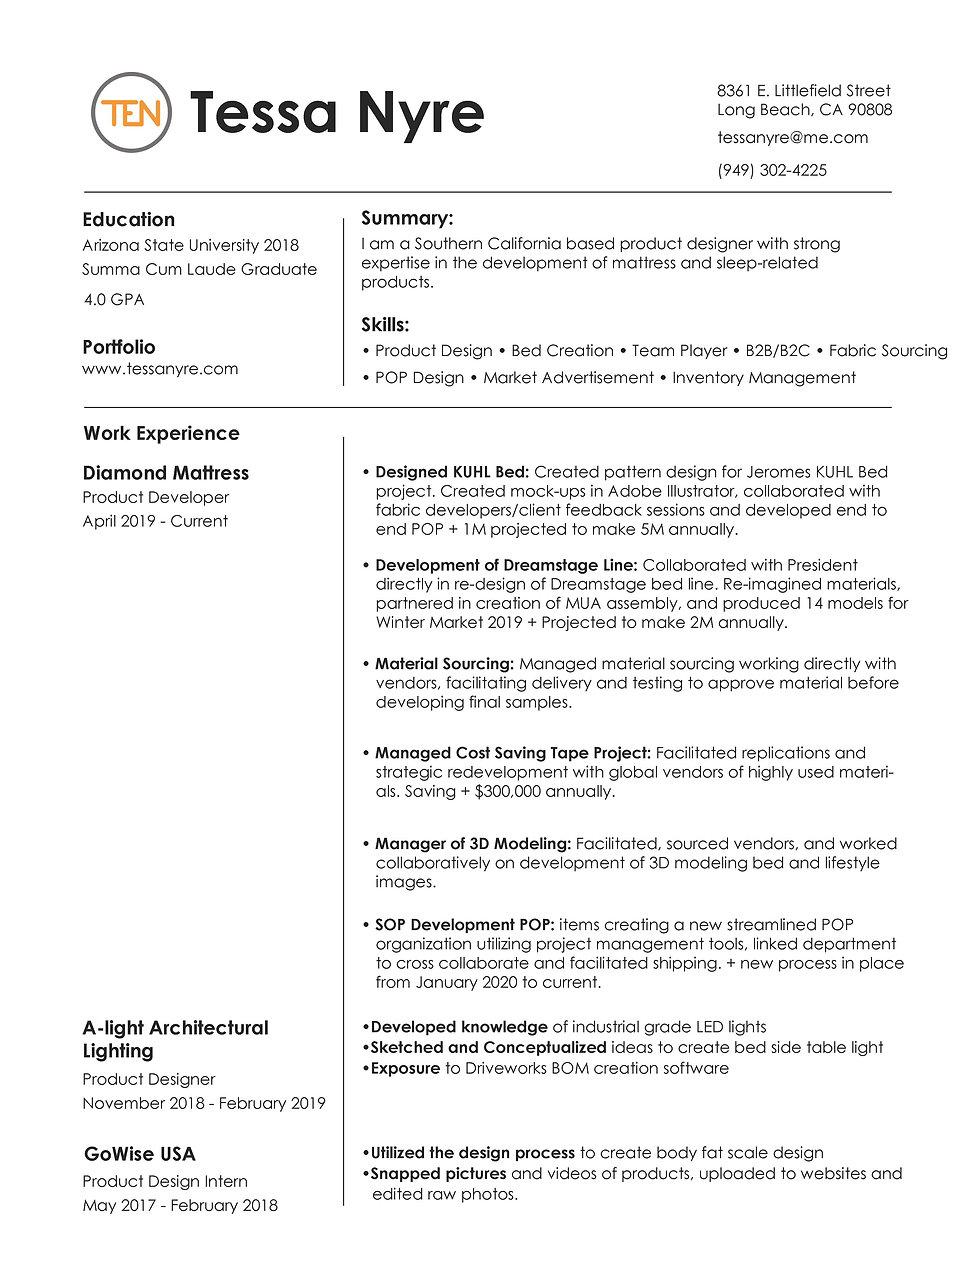 Resume _Tessa Nyre_2020 Final - Copy.jpg